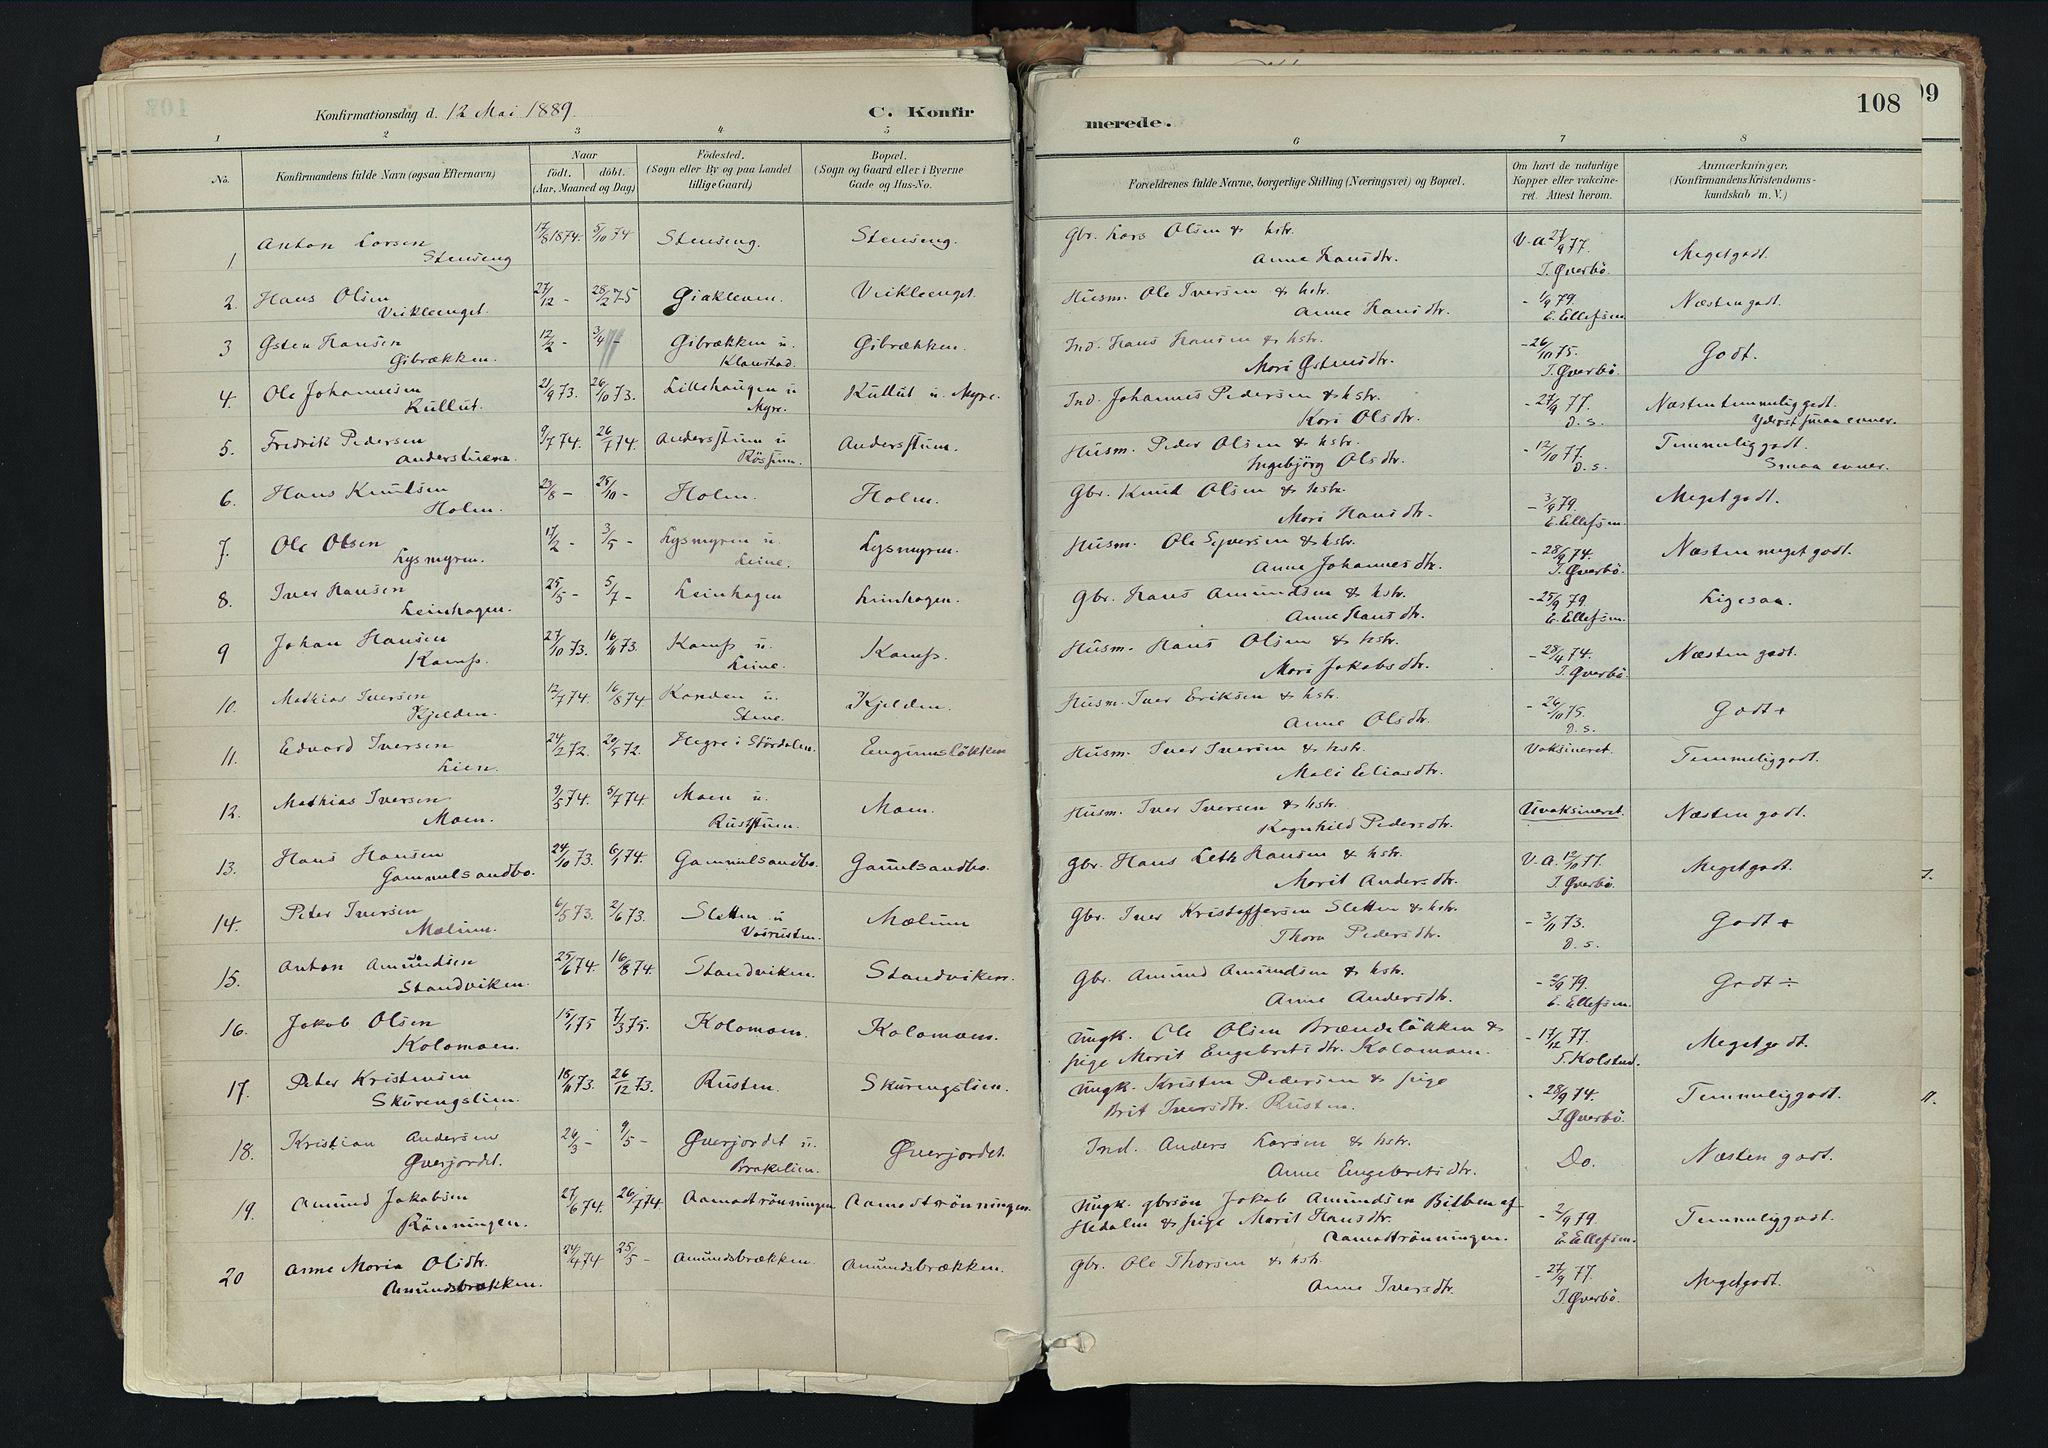 SAH, Nord-Fron prestekontor, Ministerialbok nr. 3, 1884-1914, s. 108